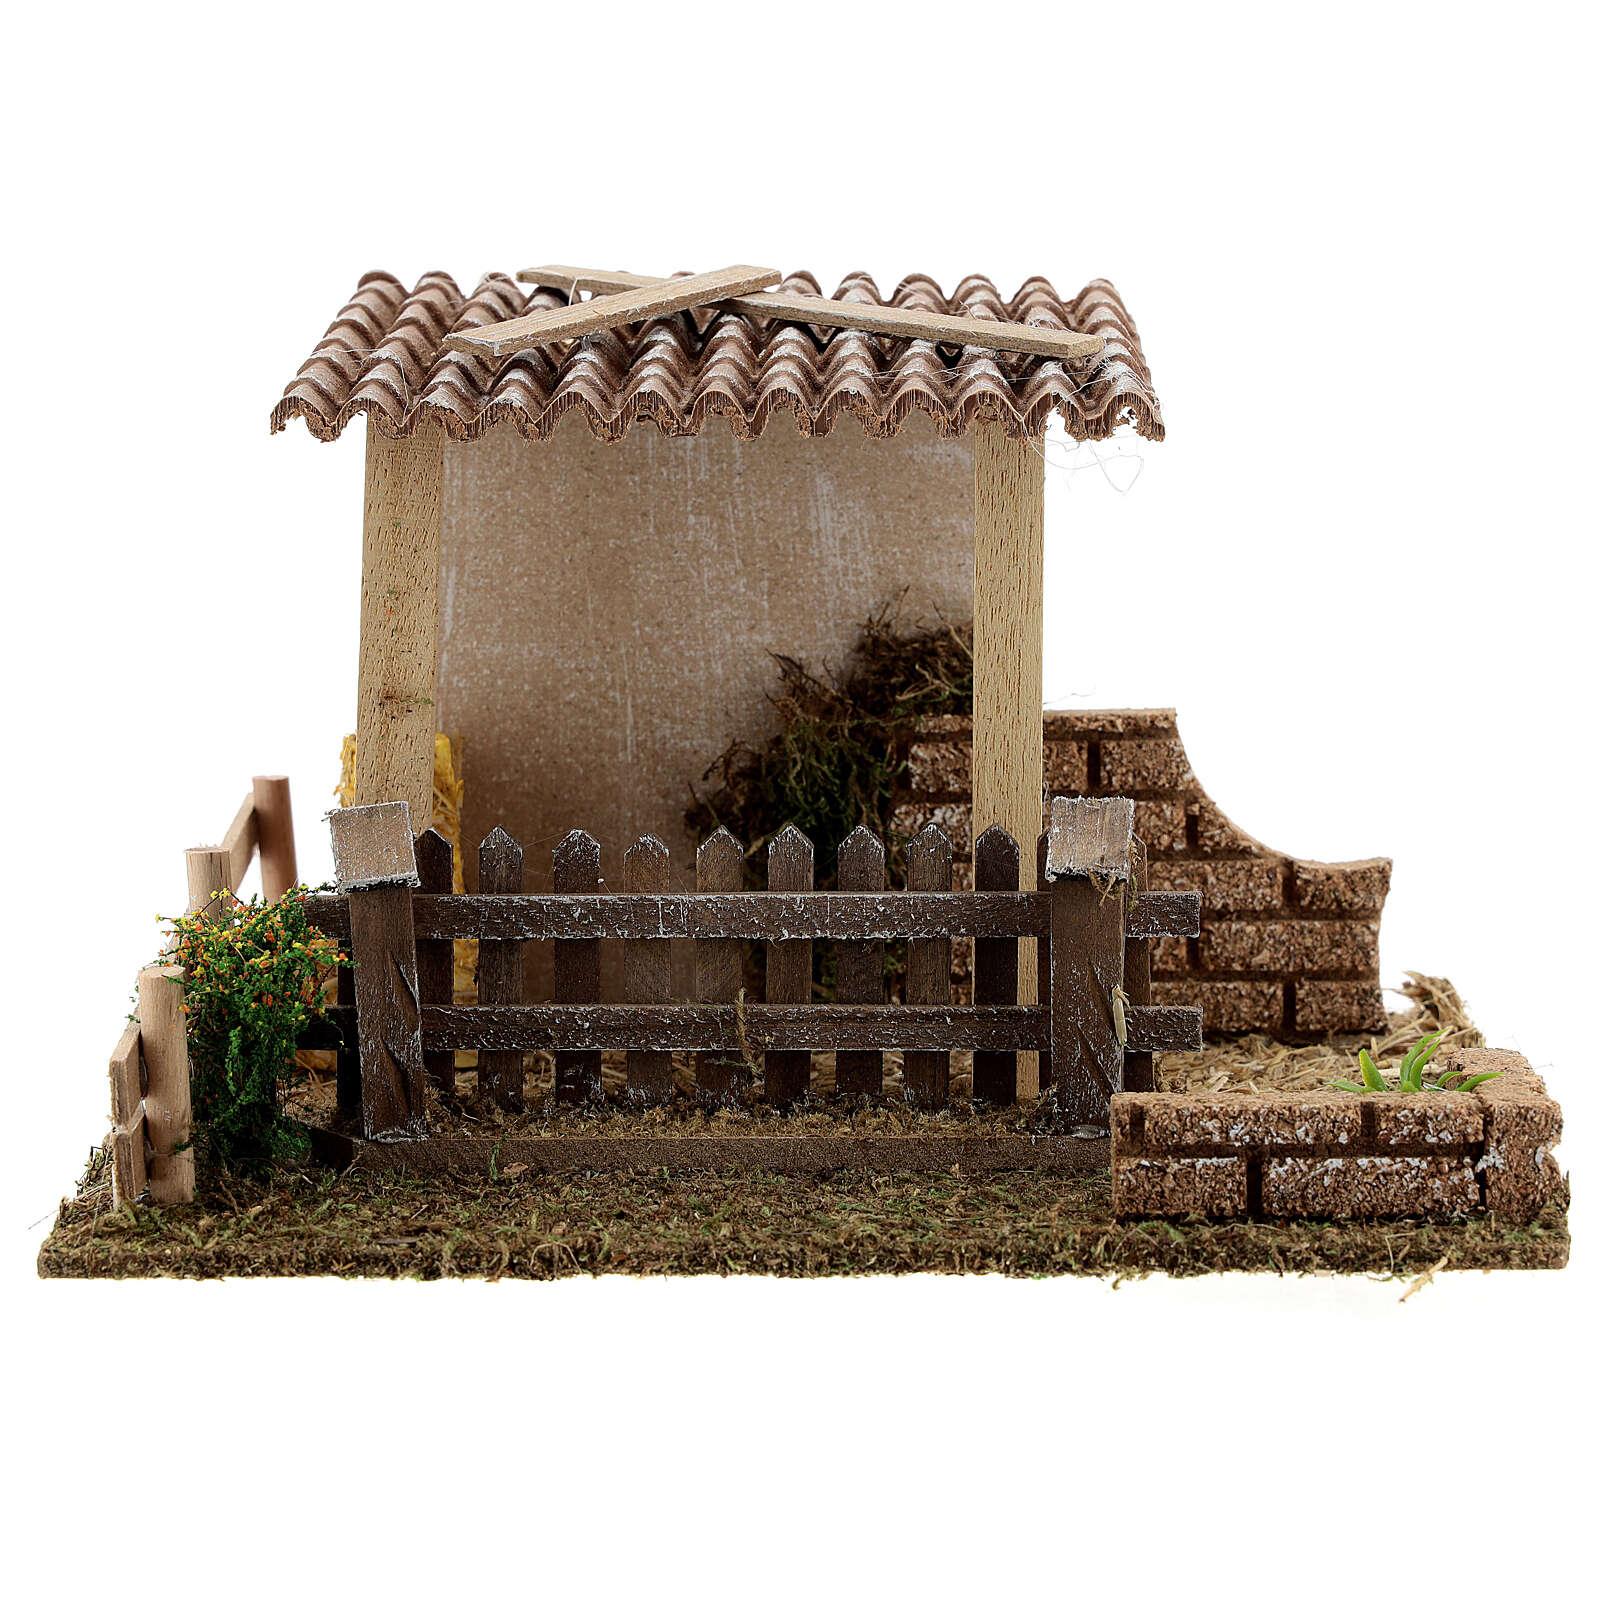 Straw barn and fence 13x19x15 cm nativity scenes 8-10 cm 4